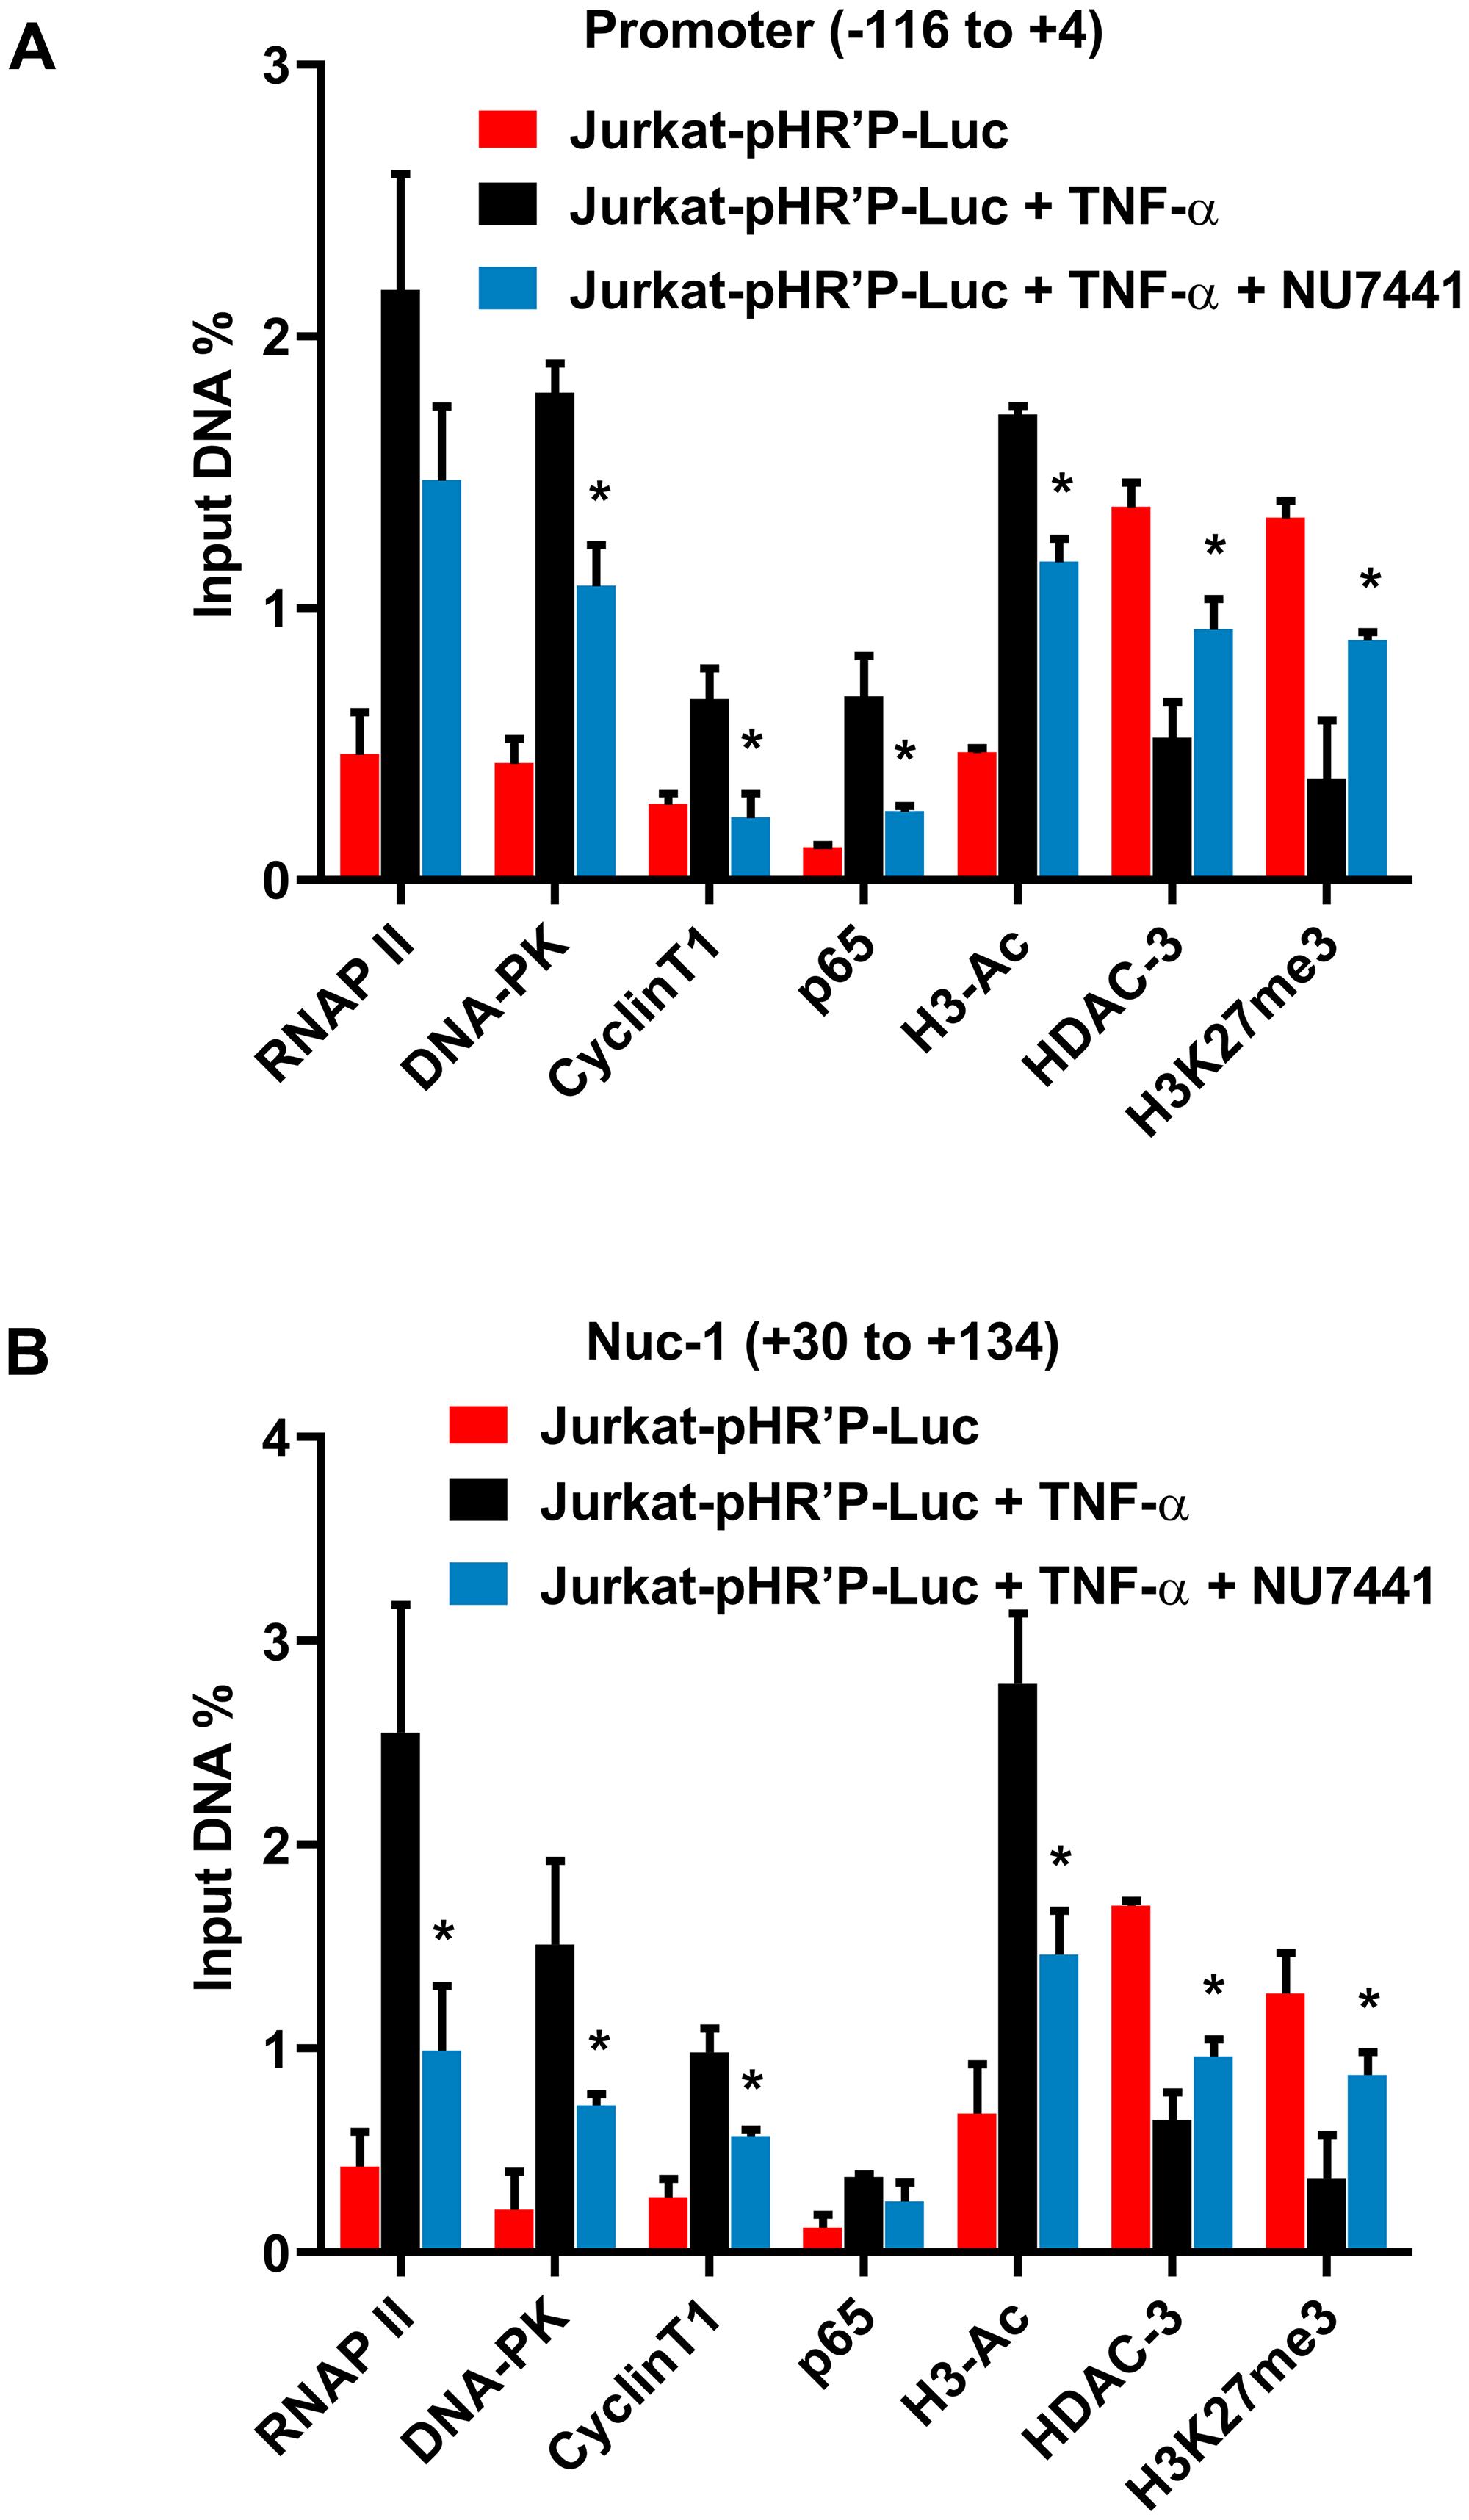 DNA-PK facilitates both the recruitment of transcription factors and establishment of euchromatin structures at HIV LTR.